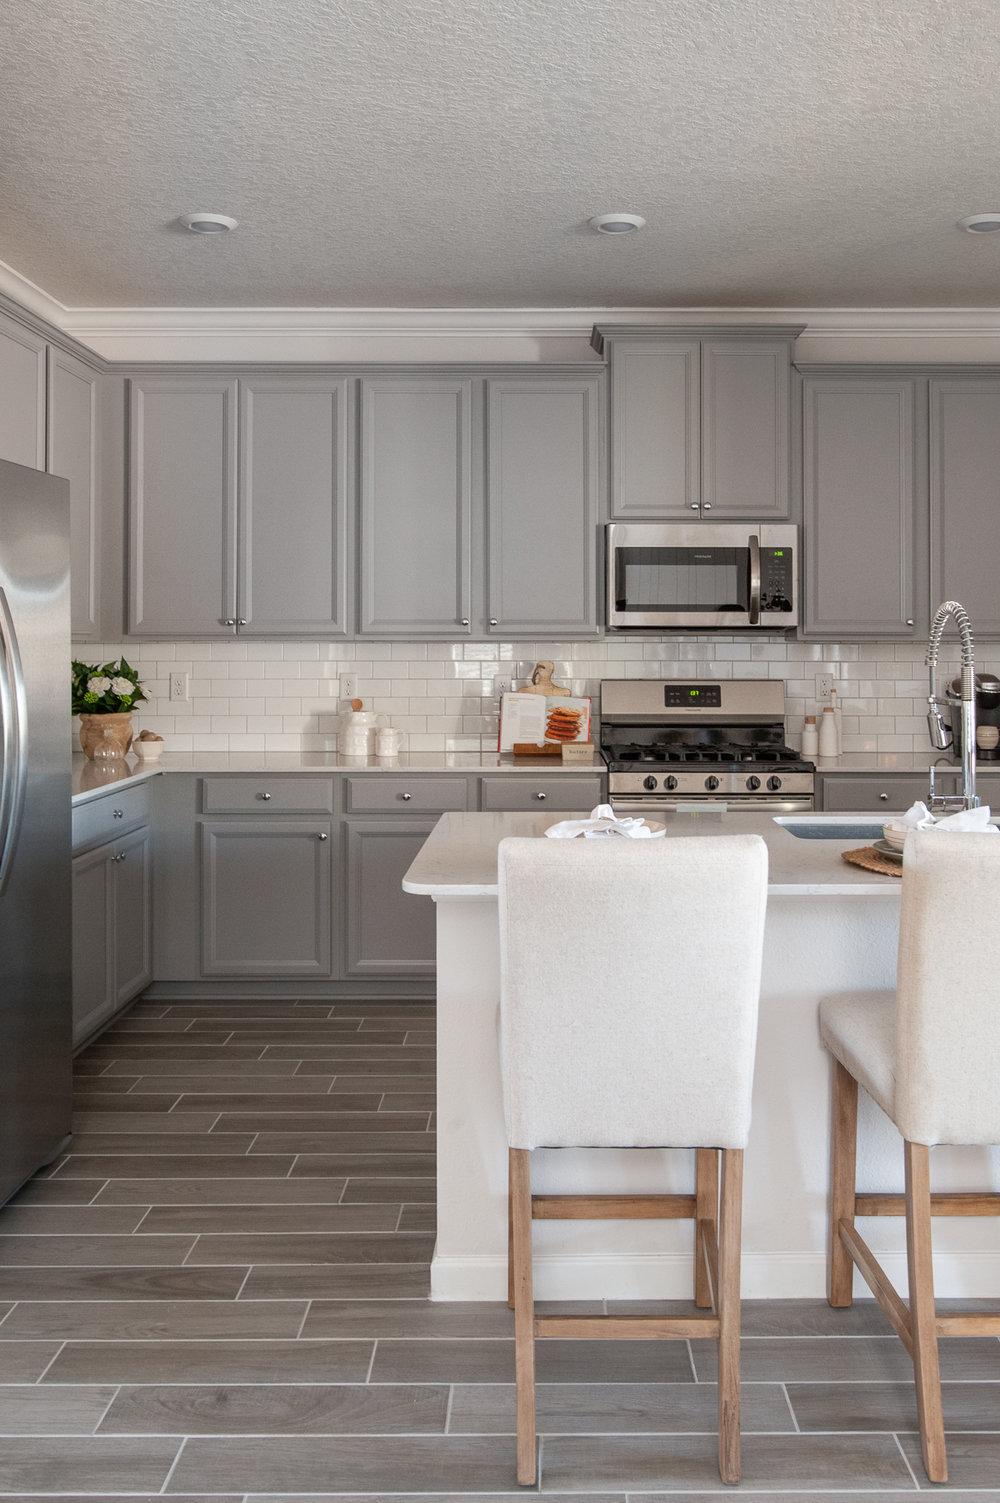 Micamy_Interior Designer_Design_Interior_Model_Merchandising_Kitchen_Grey_Cabinets_Forty West_Lennar_Place Setting_SubwayTile_Farmhouse_TileFloor.jpg